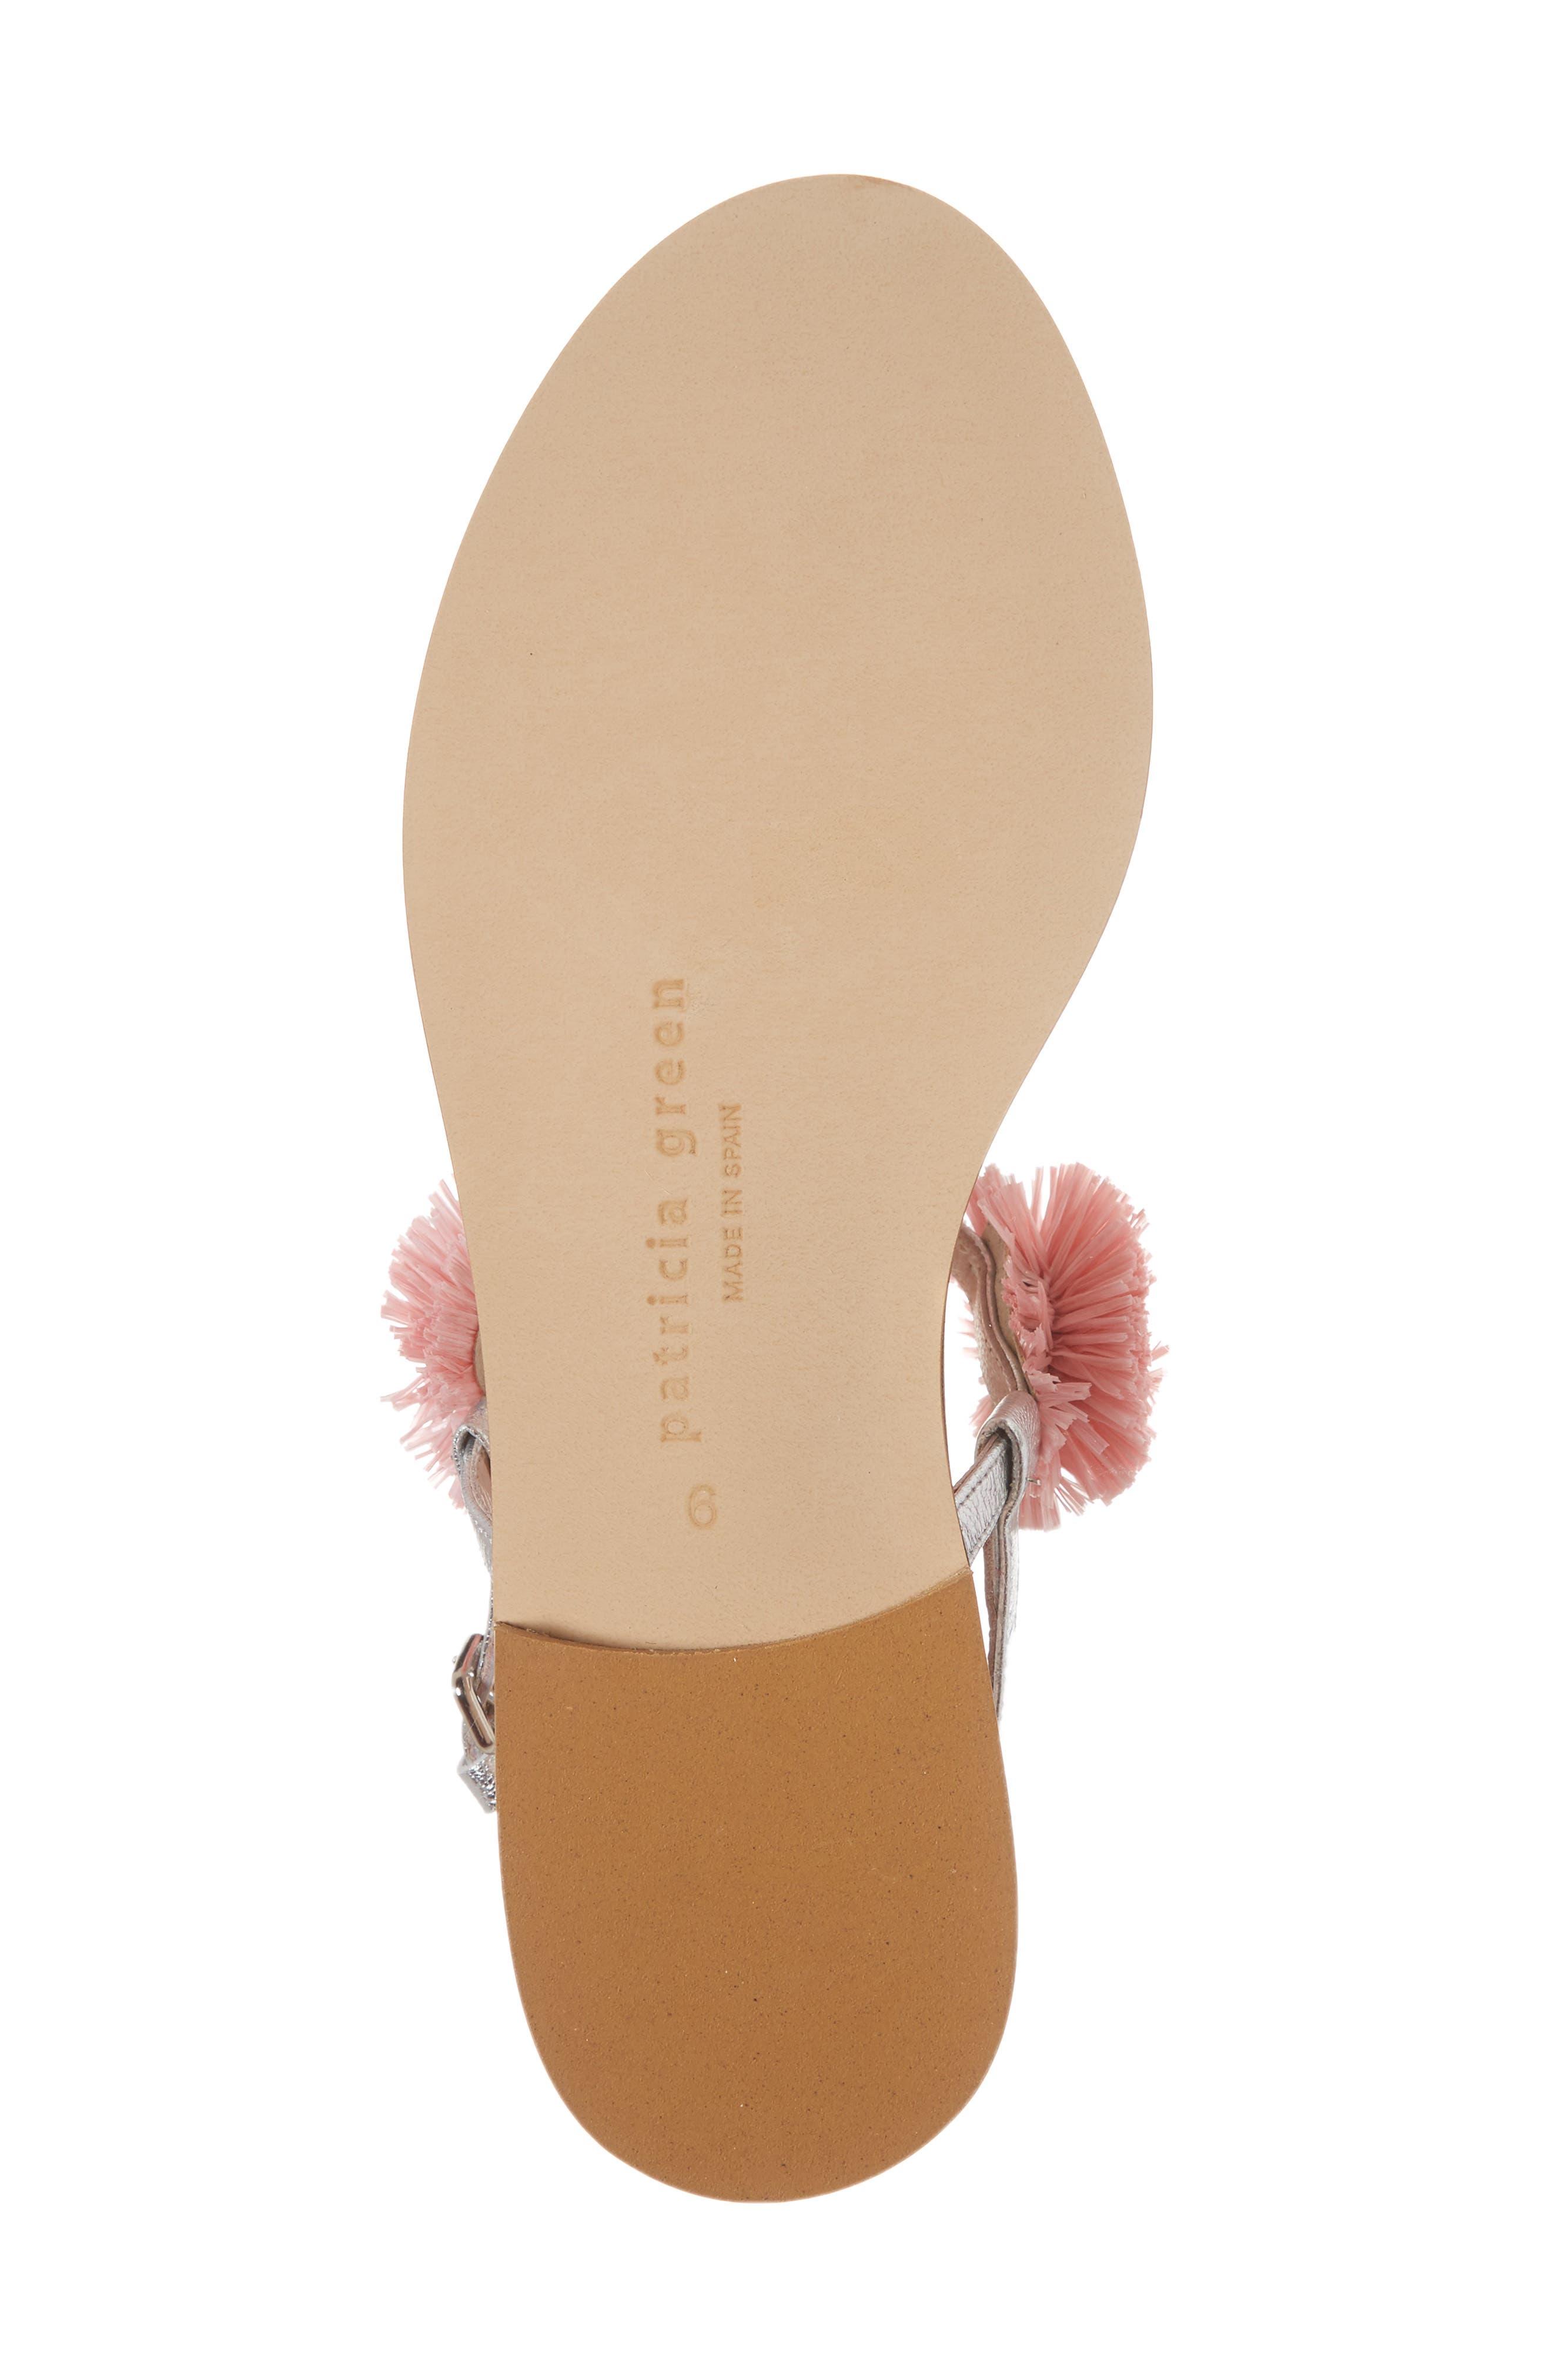 Pompom Thong Sandal,                             Alternate thumbnail 6, color,                             Pink Leather